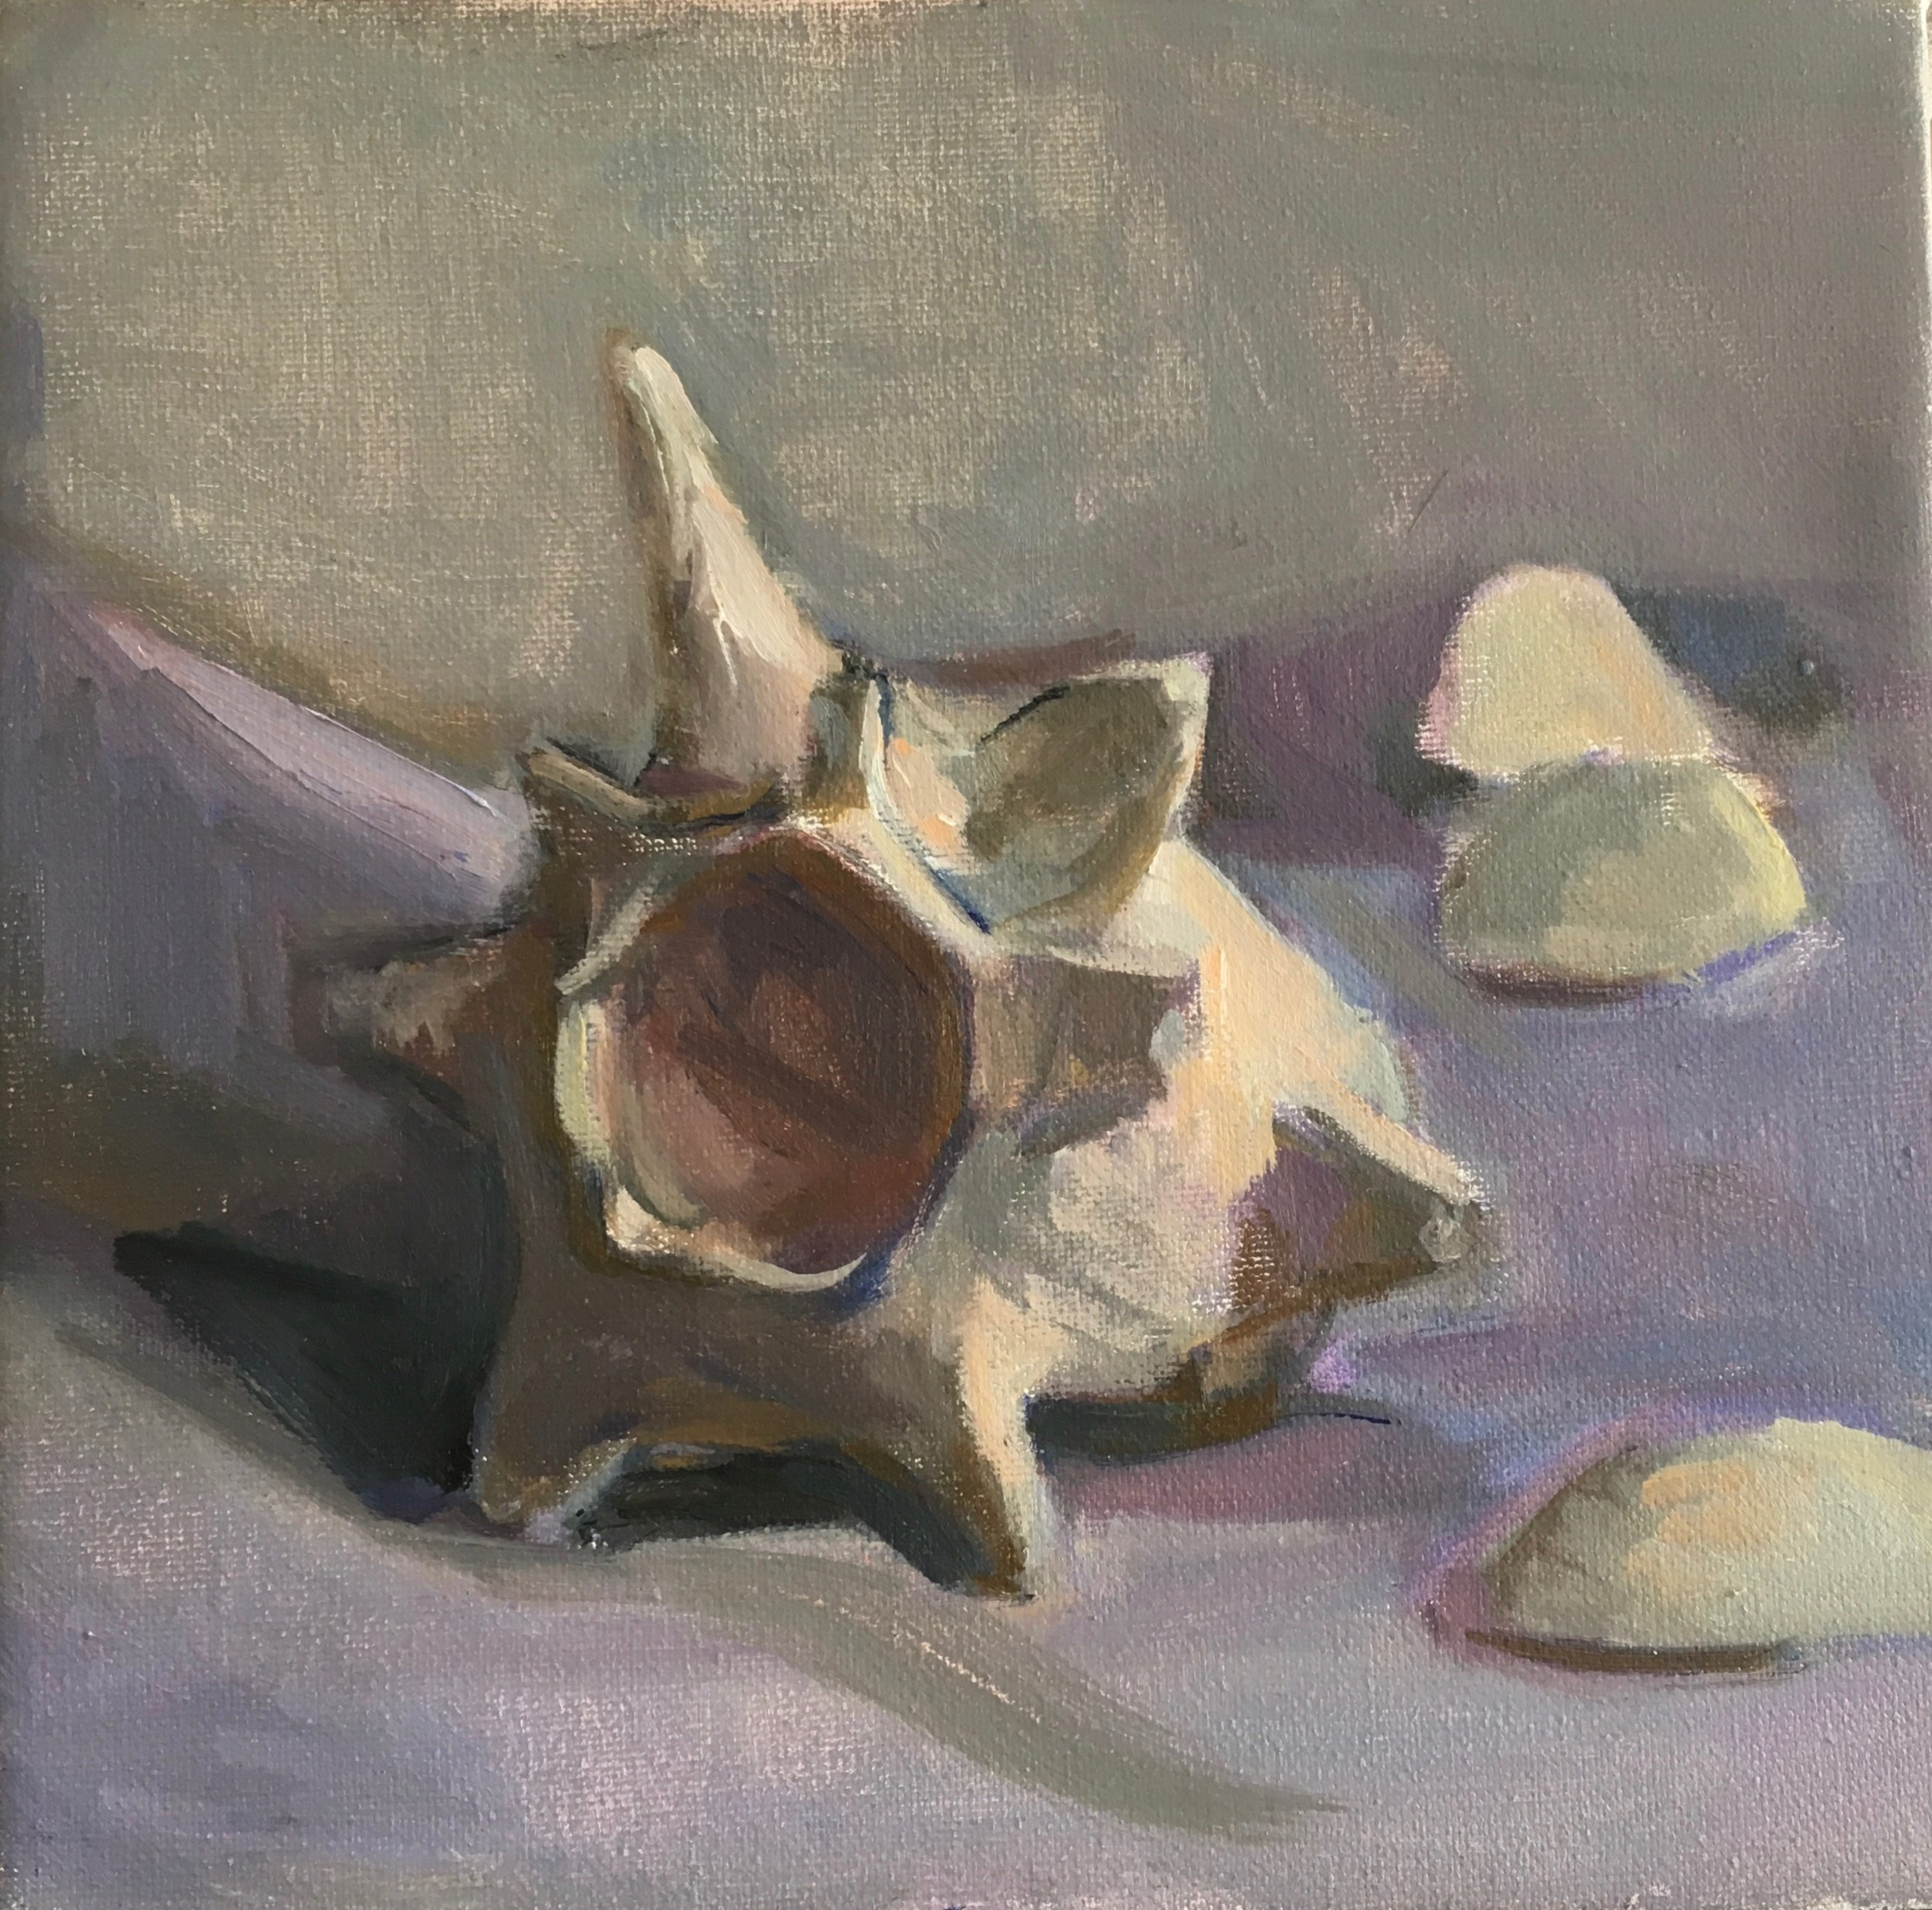 Shell on purple cloth